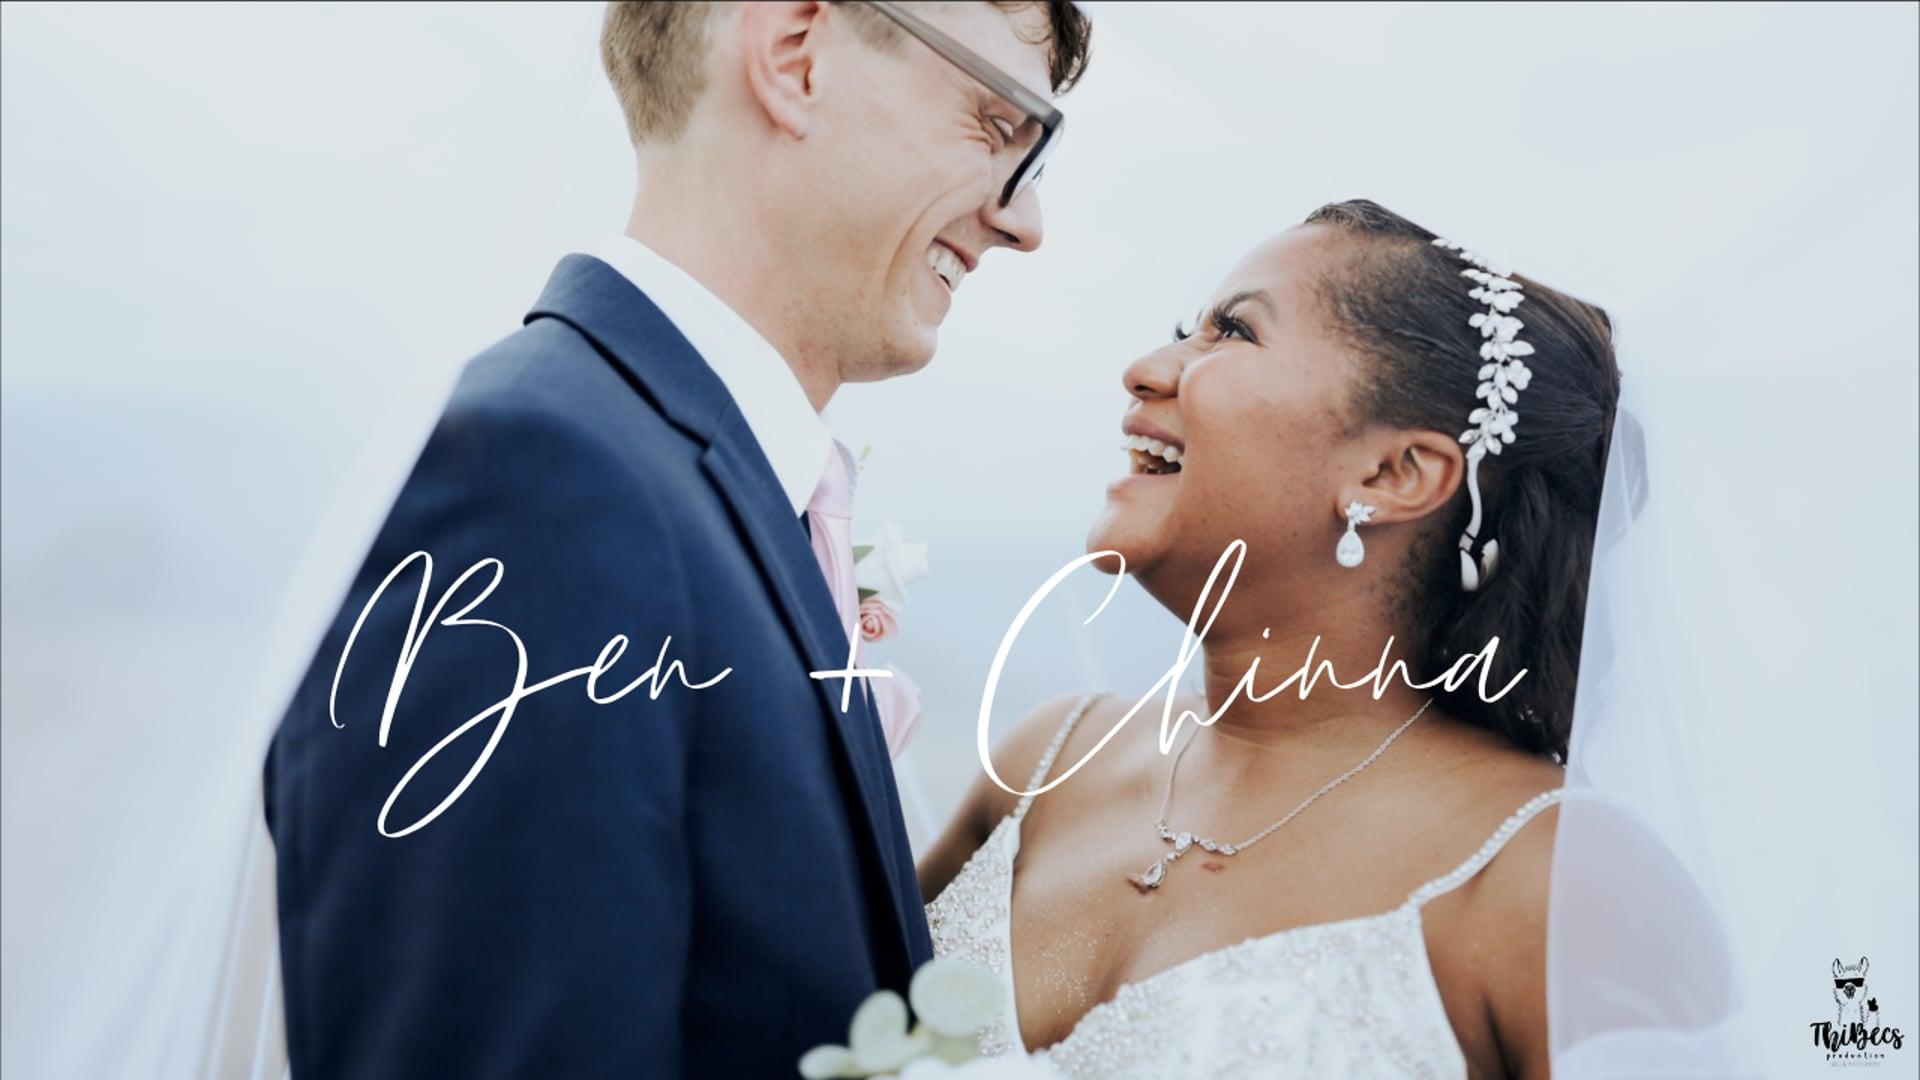 Chinna & Ben | Cinematic Highlight | Crozet, VA